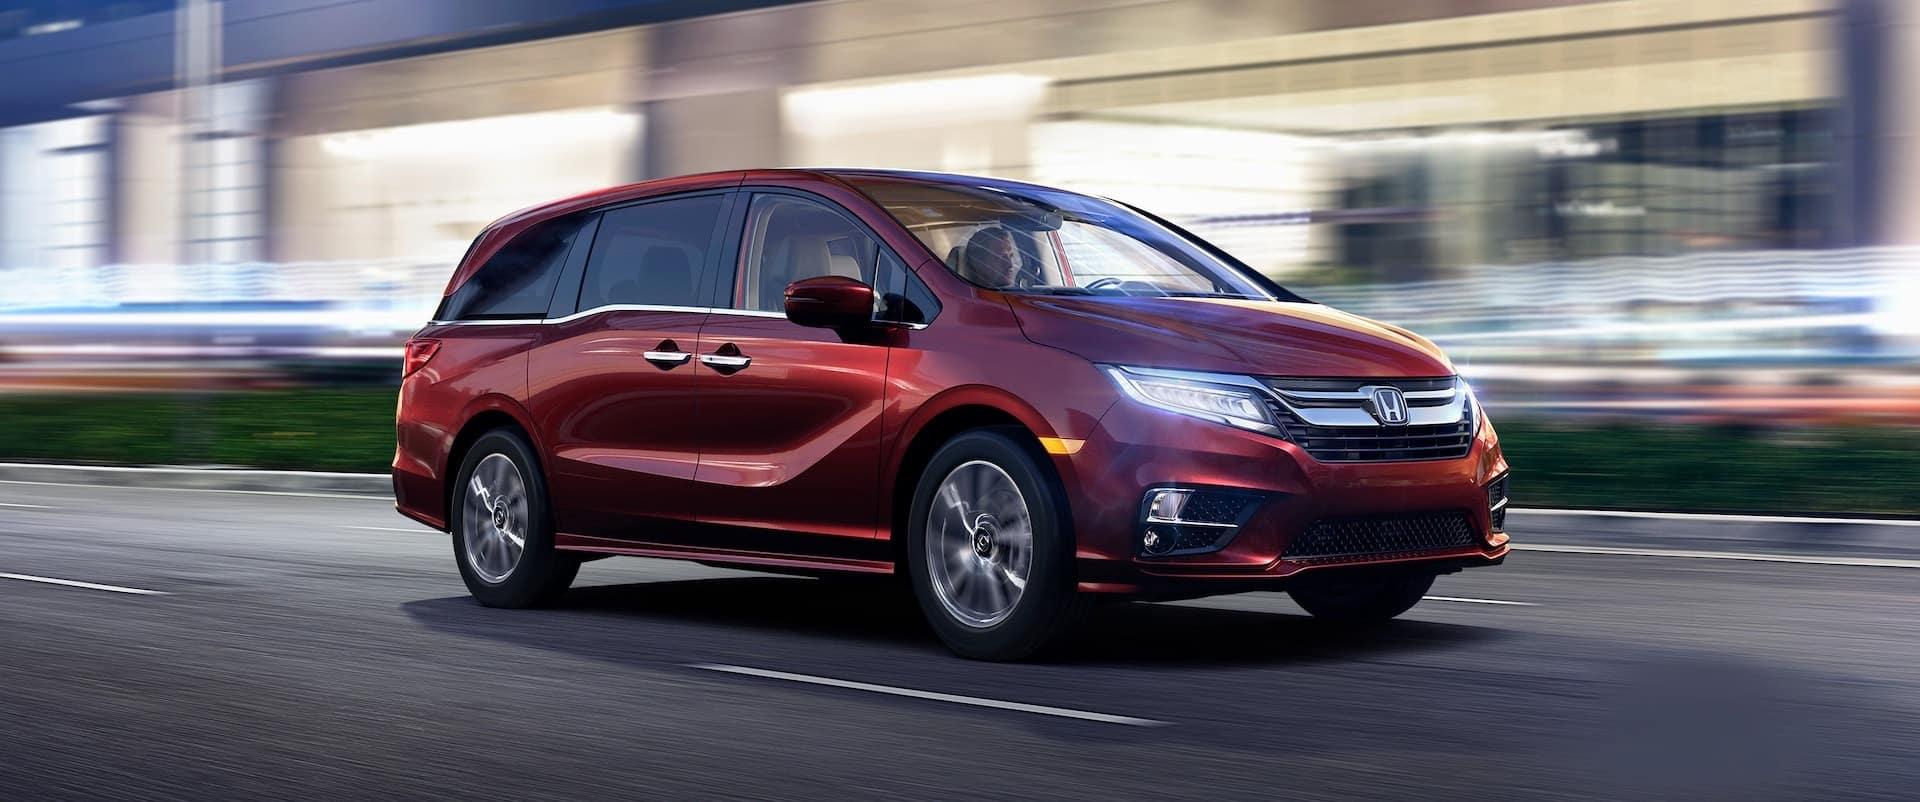 Honda_Odyssey_Driving_City